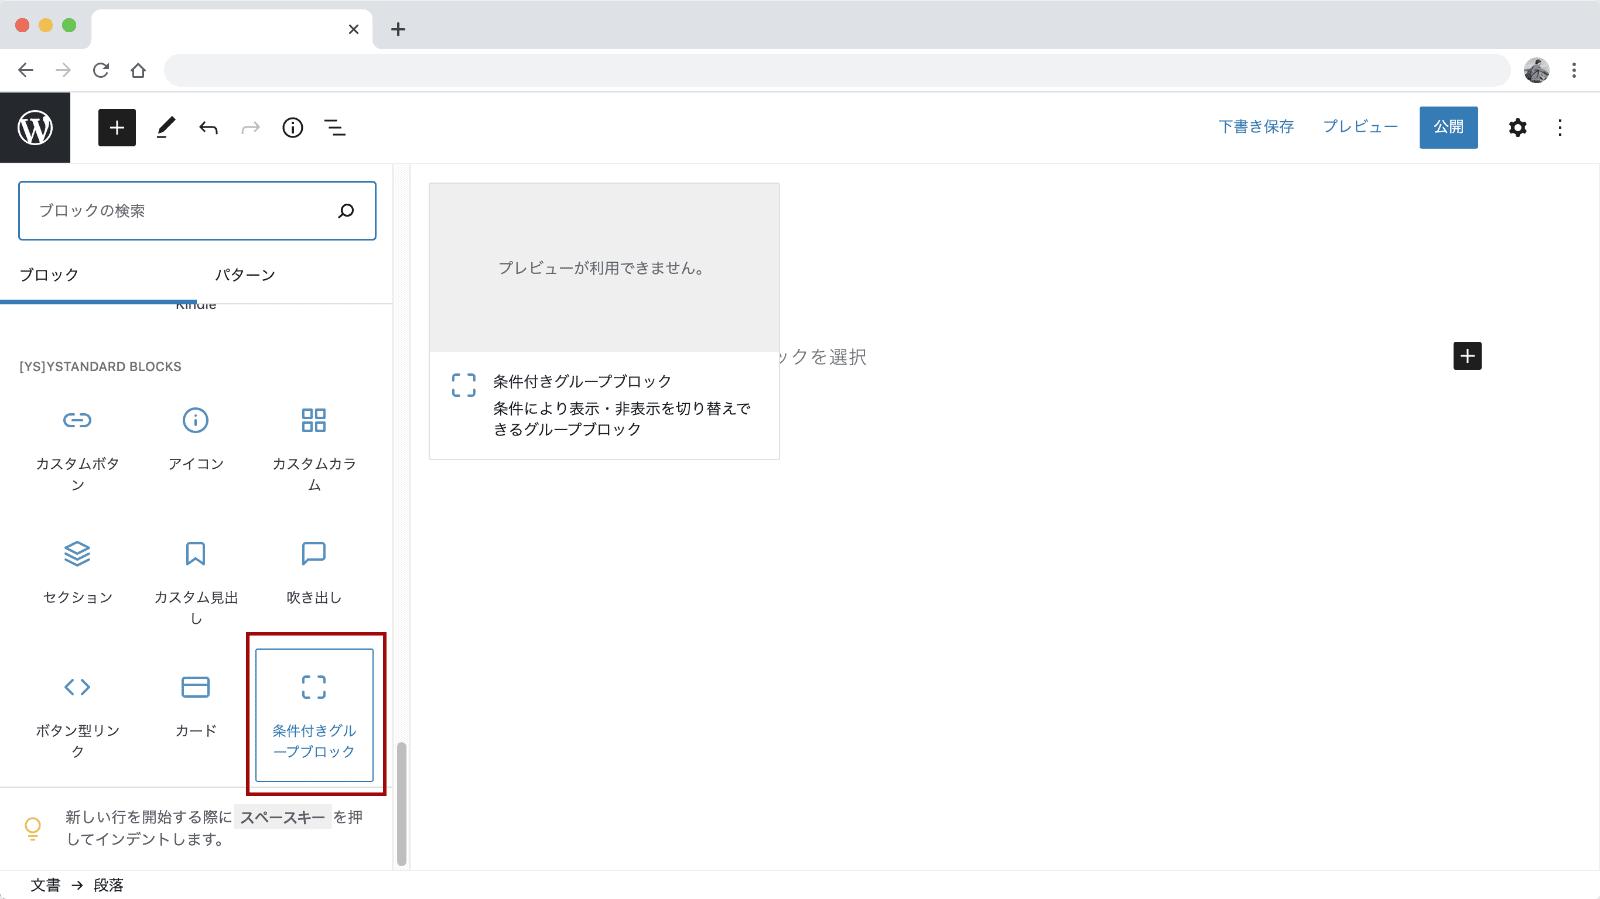 yStandard Blocksの「条件付きグループブロック」を追加